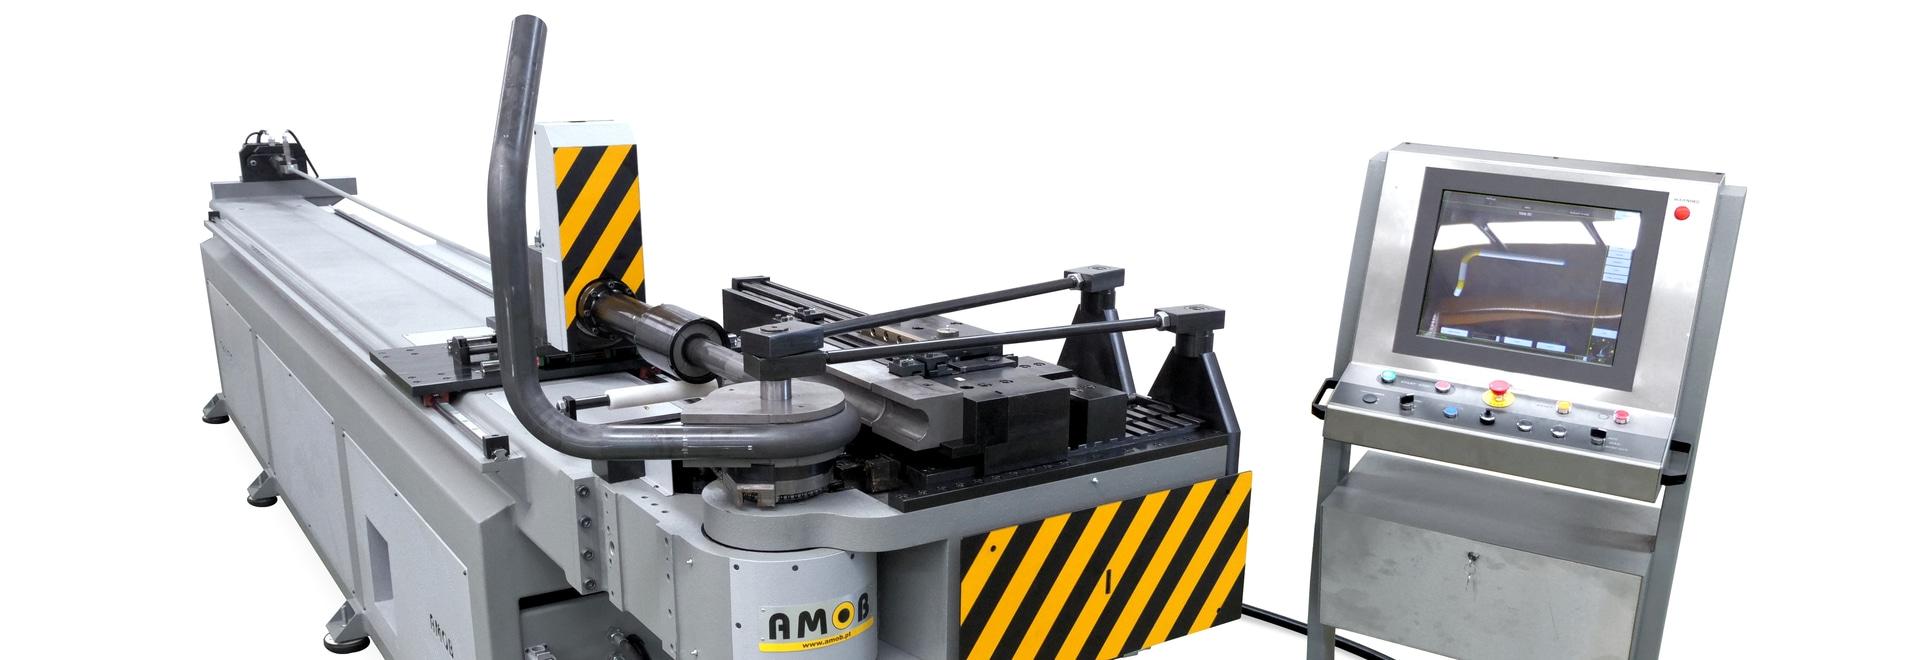 AMOB LIEFERT CNC-ROHR-BIEGER-PAKET AN LIVESTOCK EQUIPMENT COMPANY